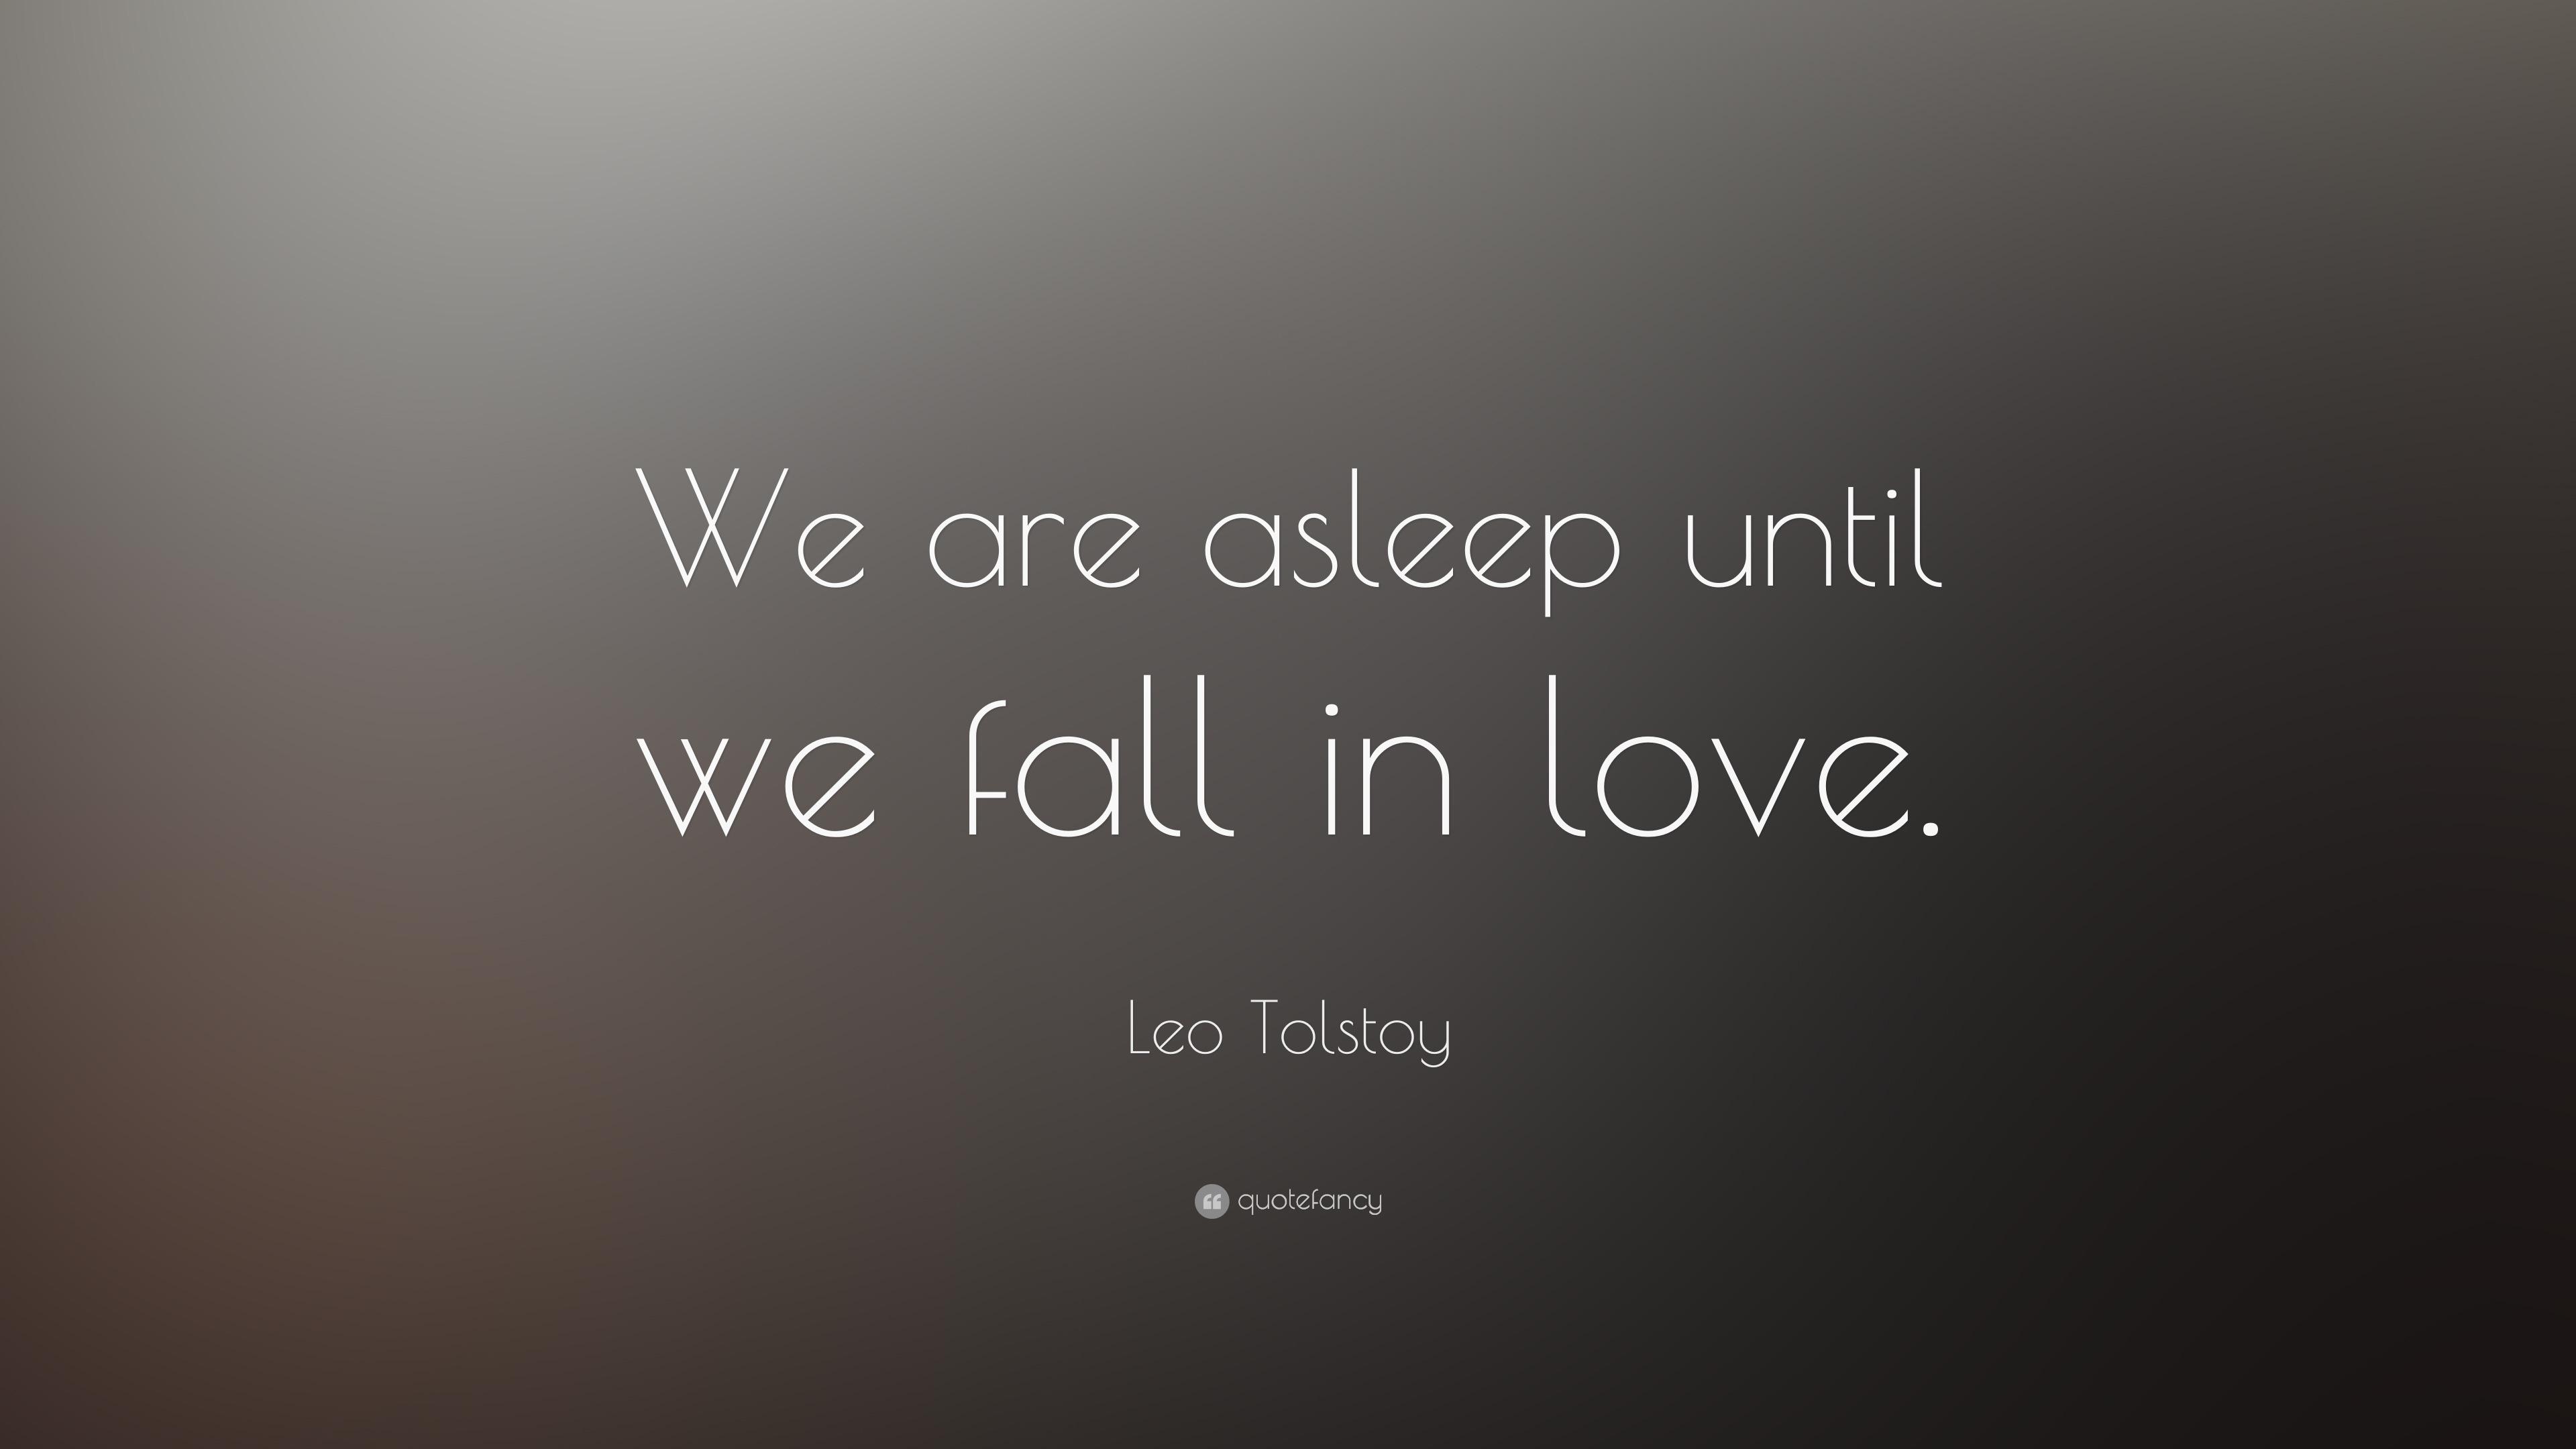 Socrates Wallpaper Quotes Leo Tolstoy Quotes 100 Wallpapers Quotefancy